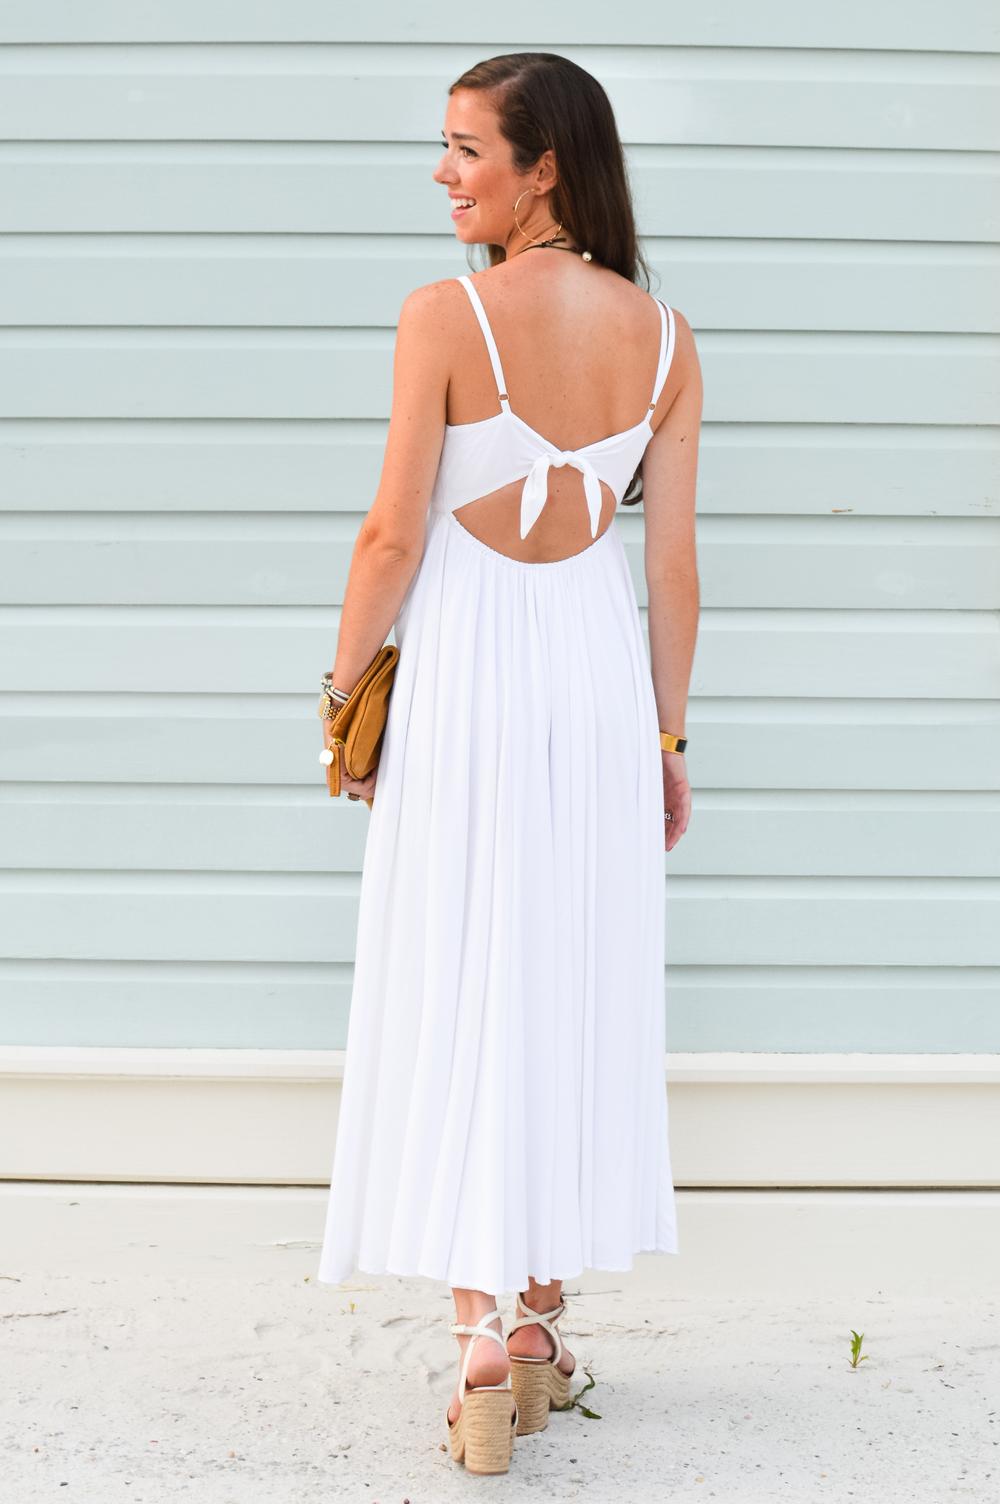 lcb_style_fashion_blogger_seaside florida (16 of 32).jpg